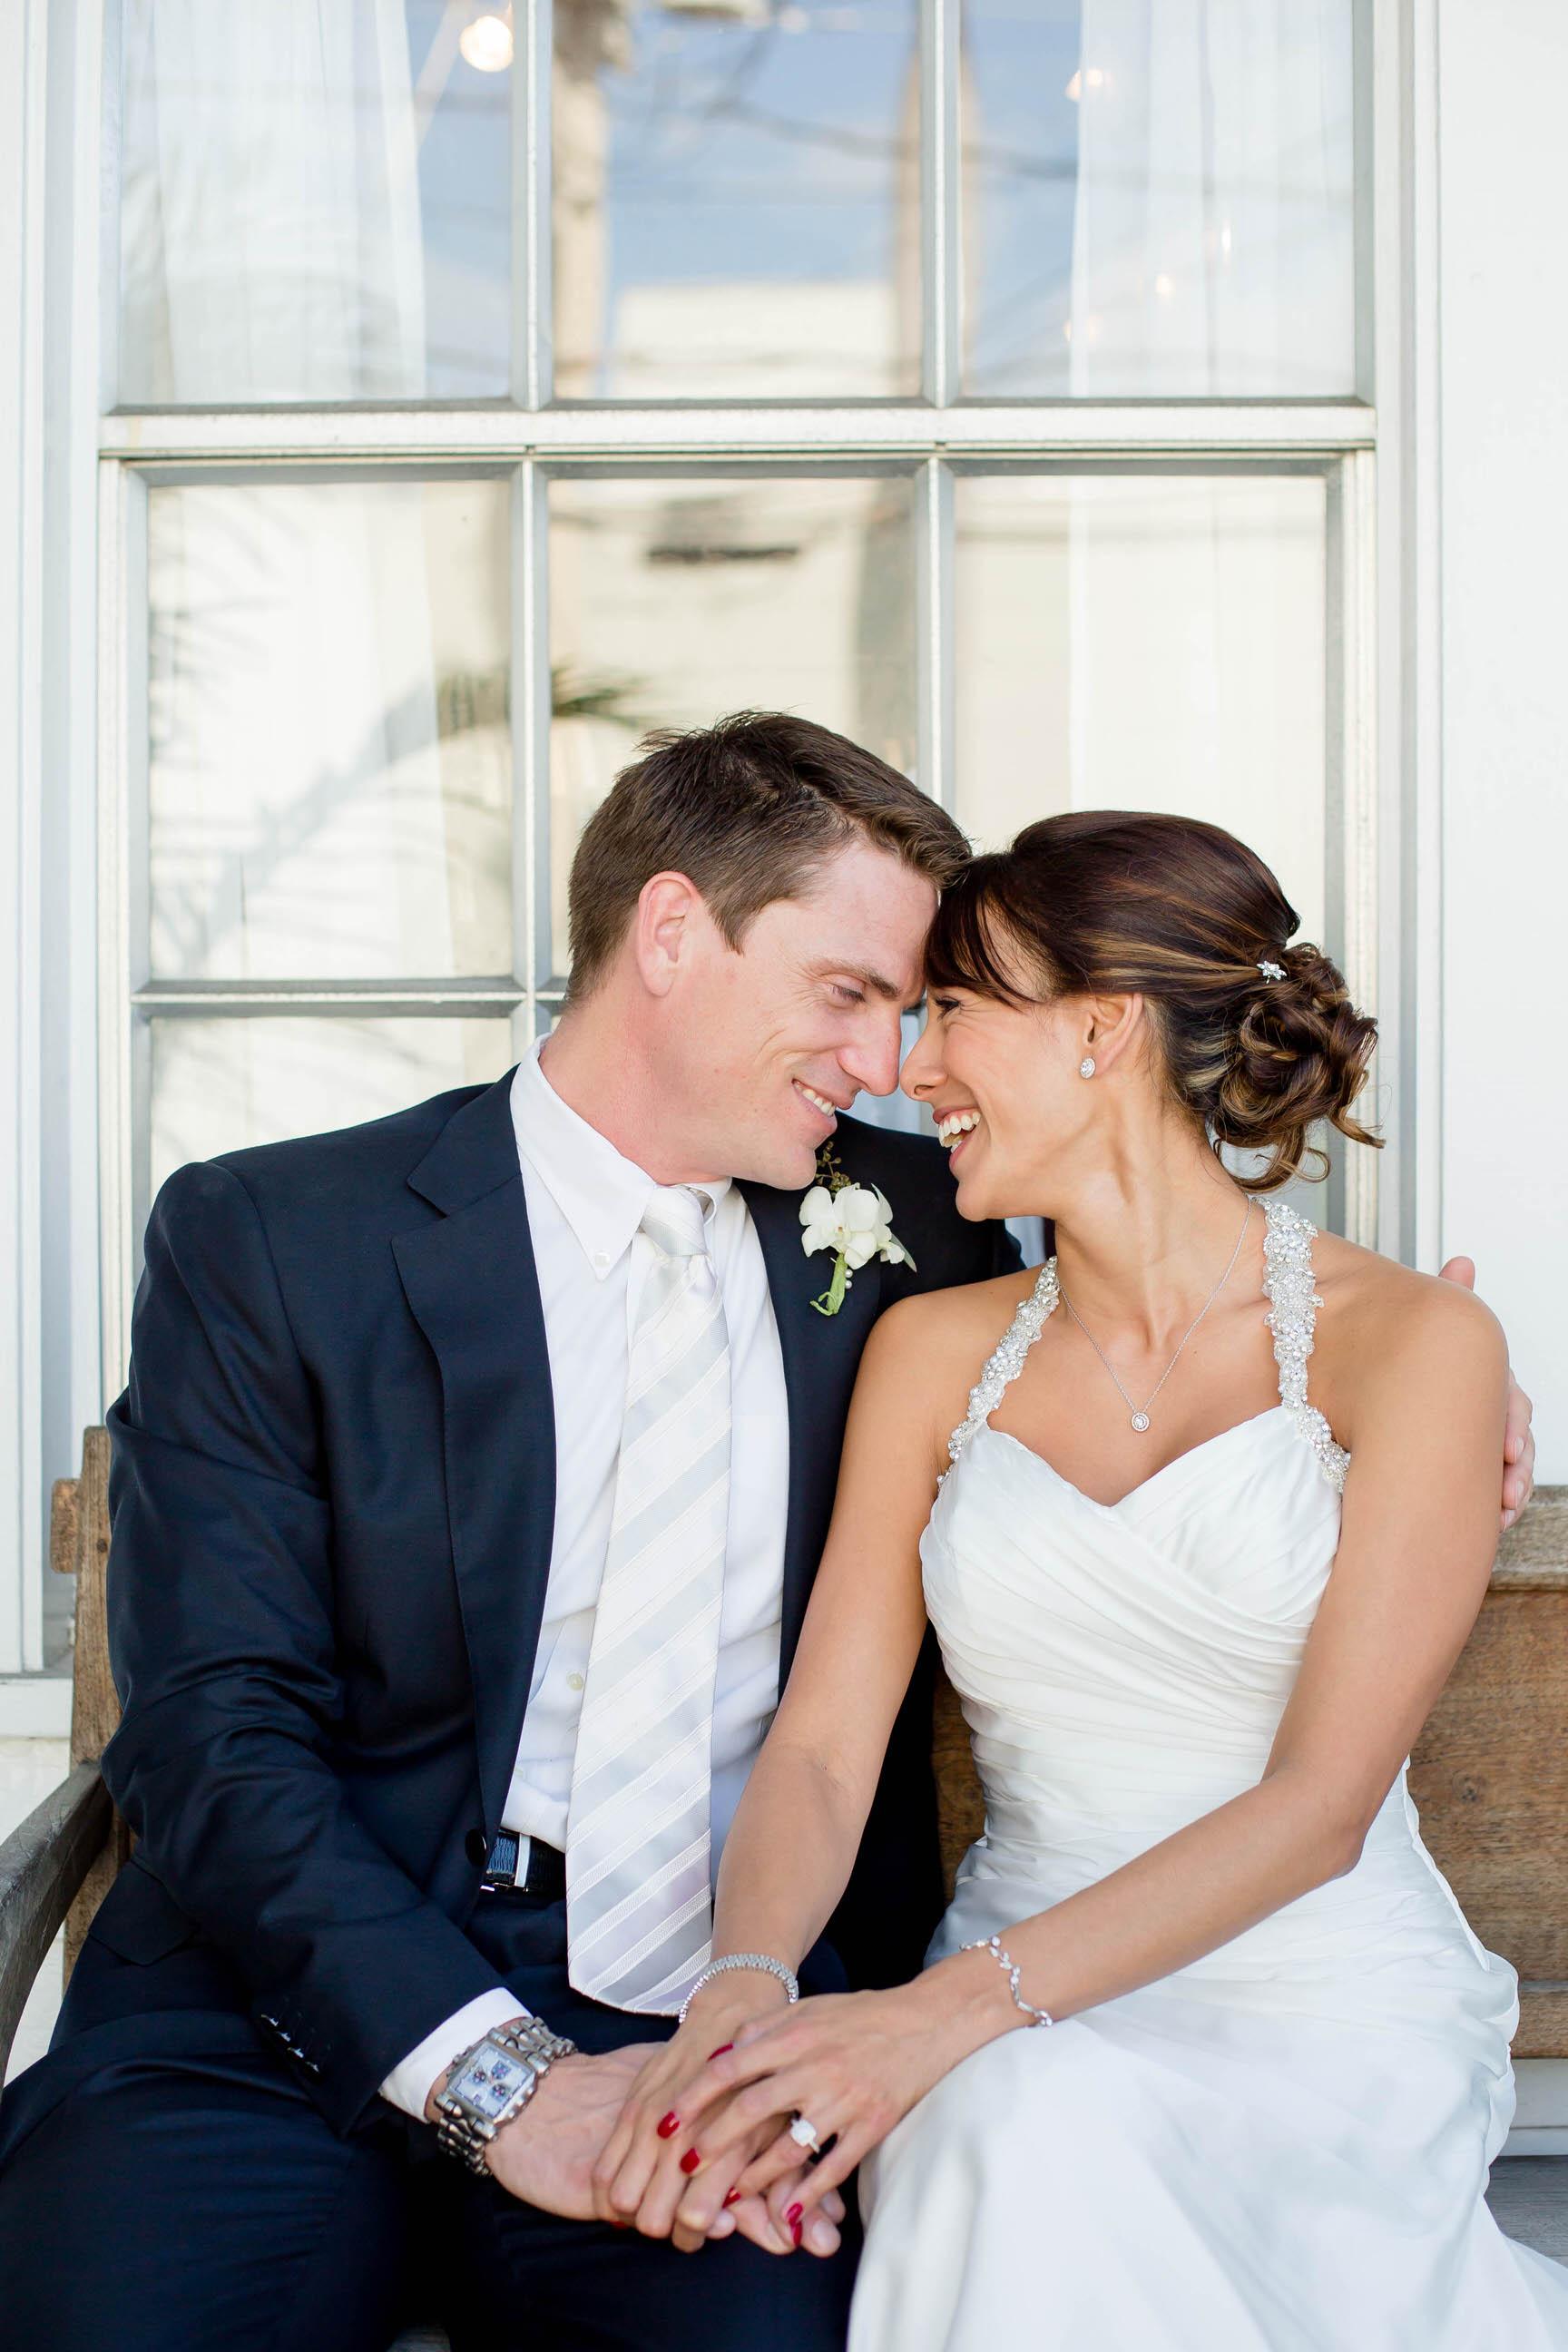 happy_wedding_couple_florida_keys_photographer_tiny_house_photo.jpg